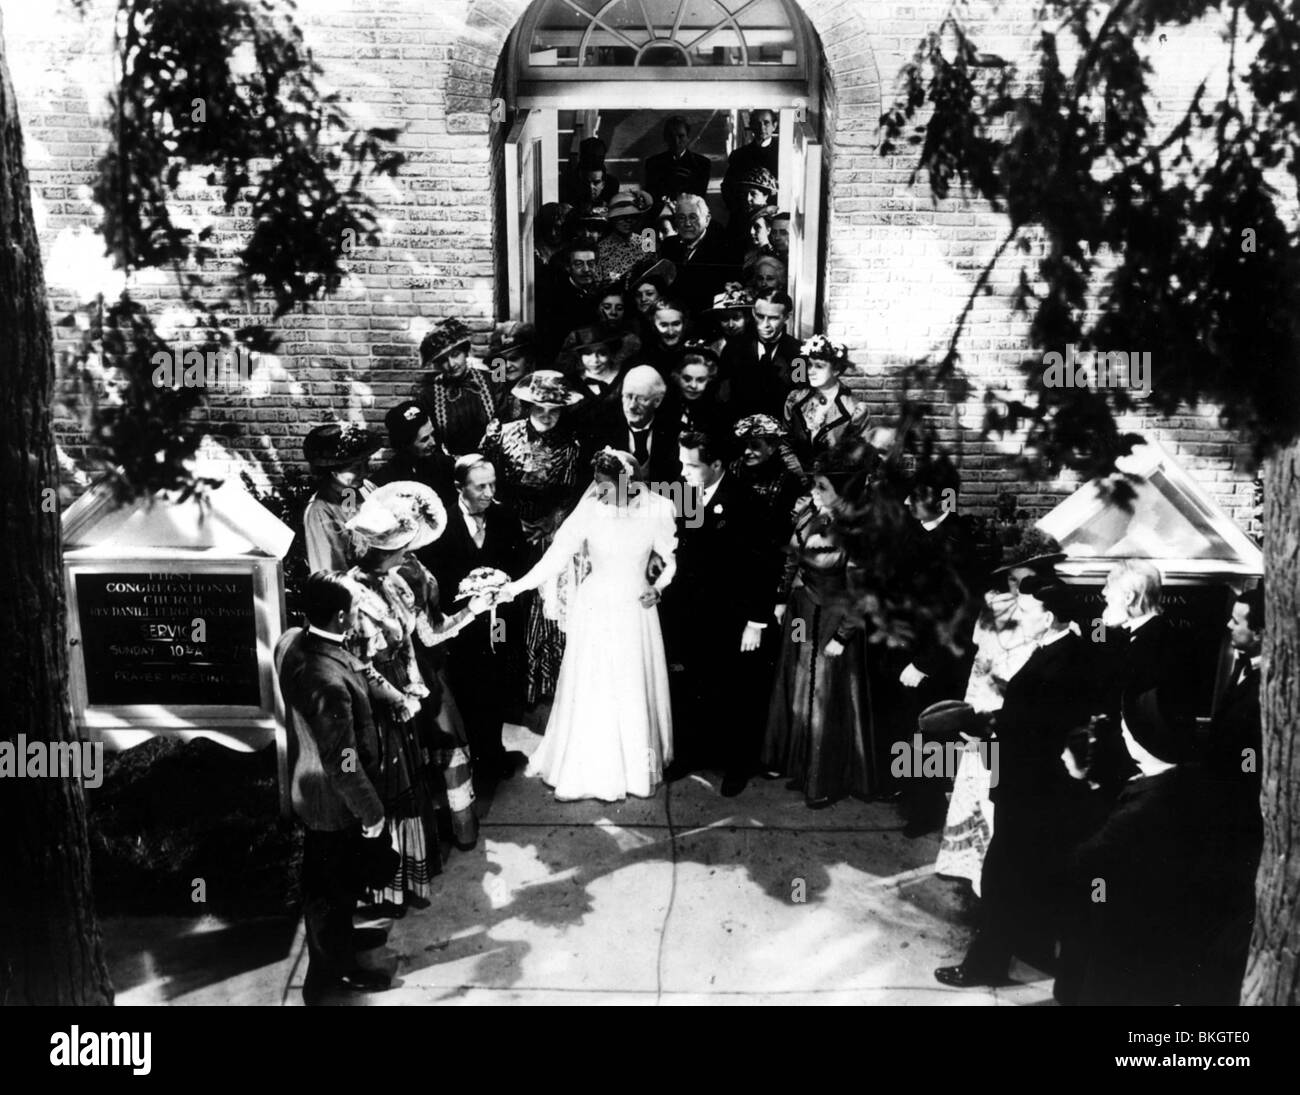 NOSTRA CITTÀ-1940 Immagini Stock